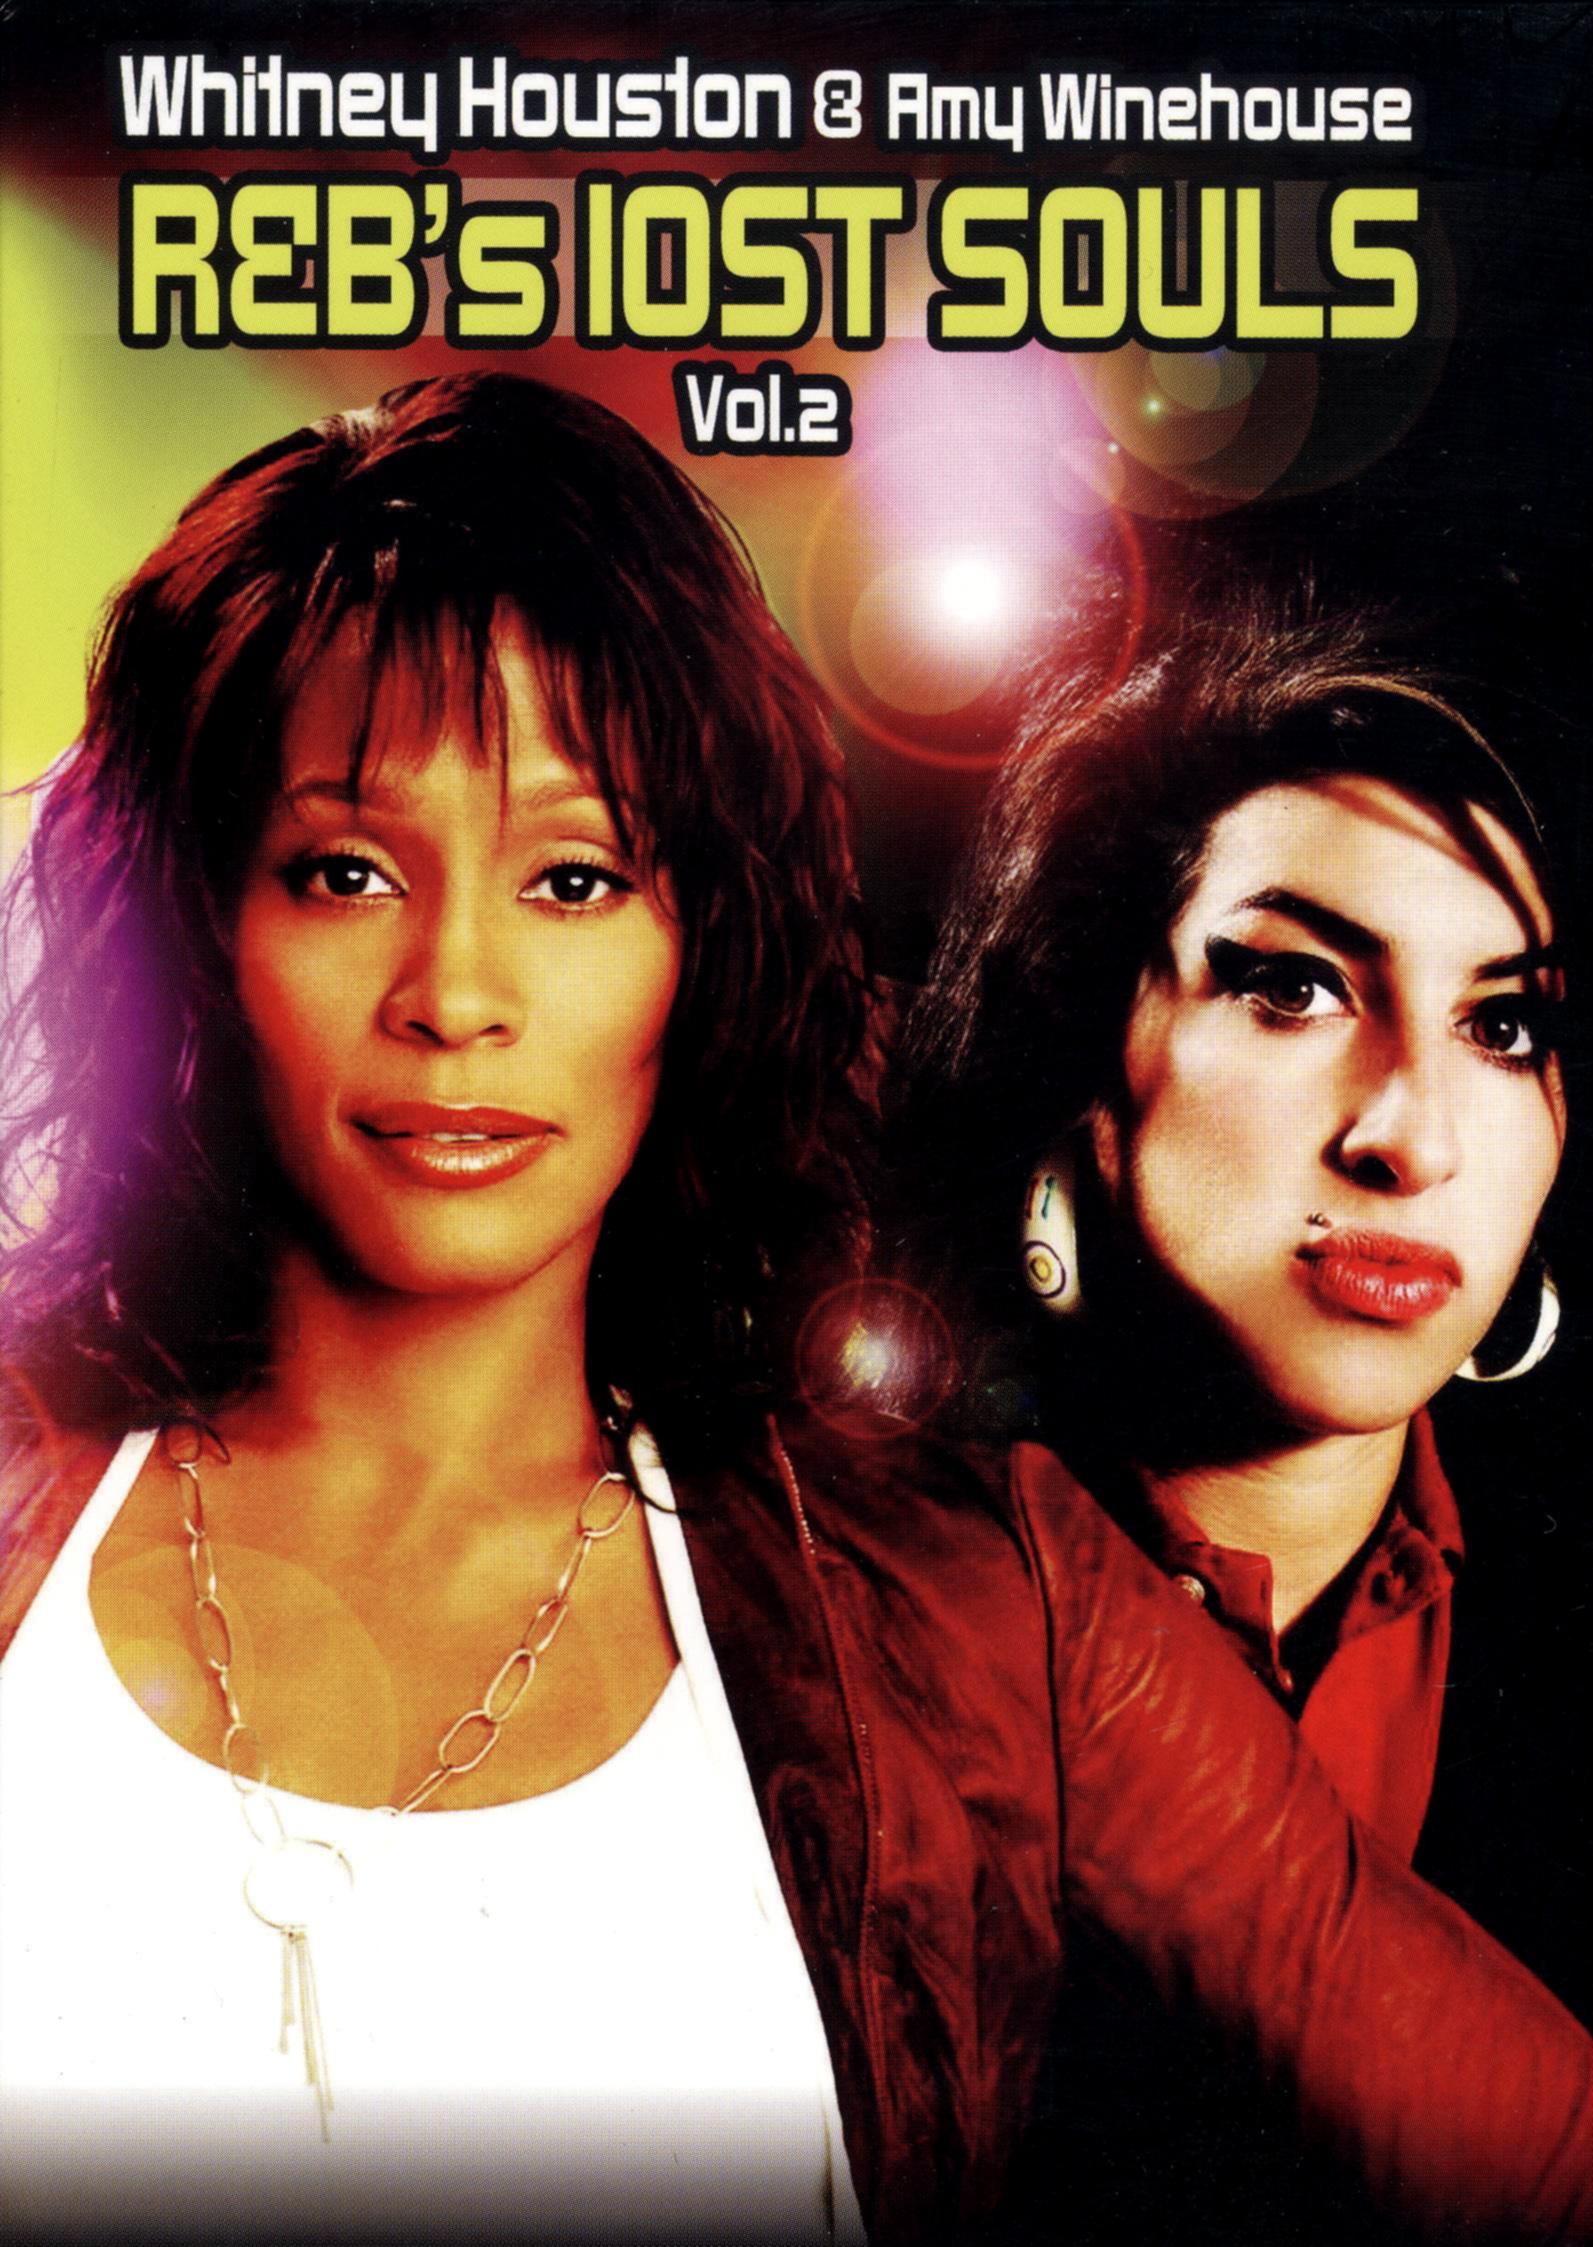 Whitney Houston & Amy Winehouse: R&B's Lost Souls, Vol. 2